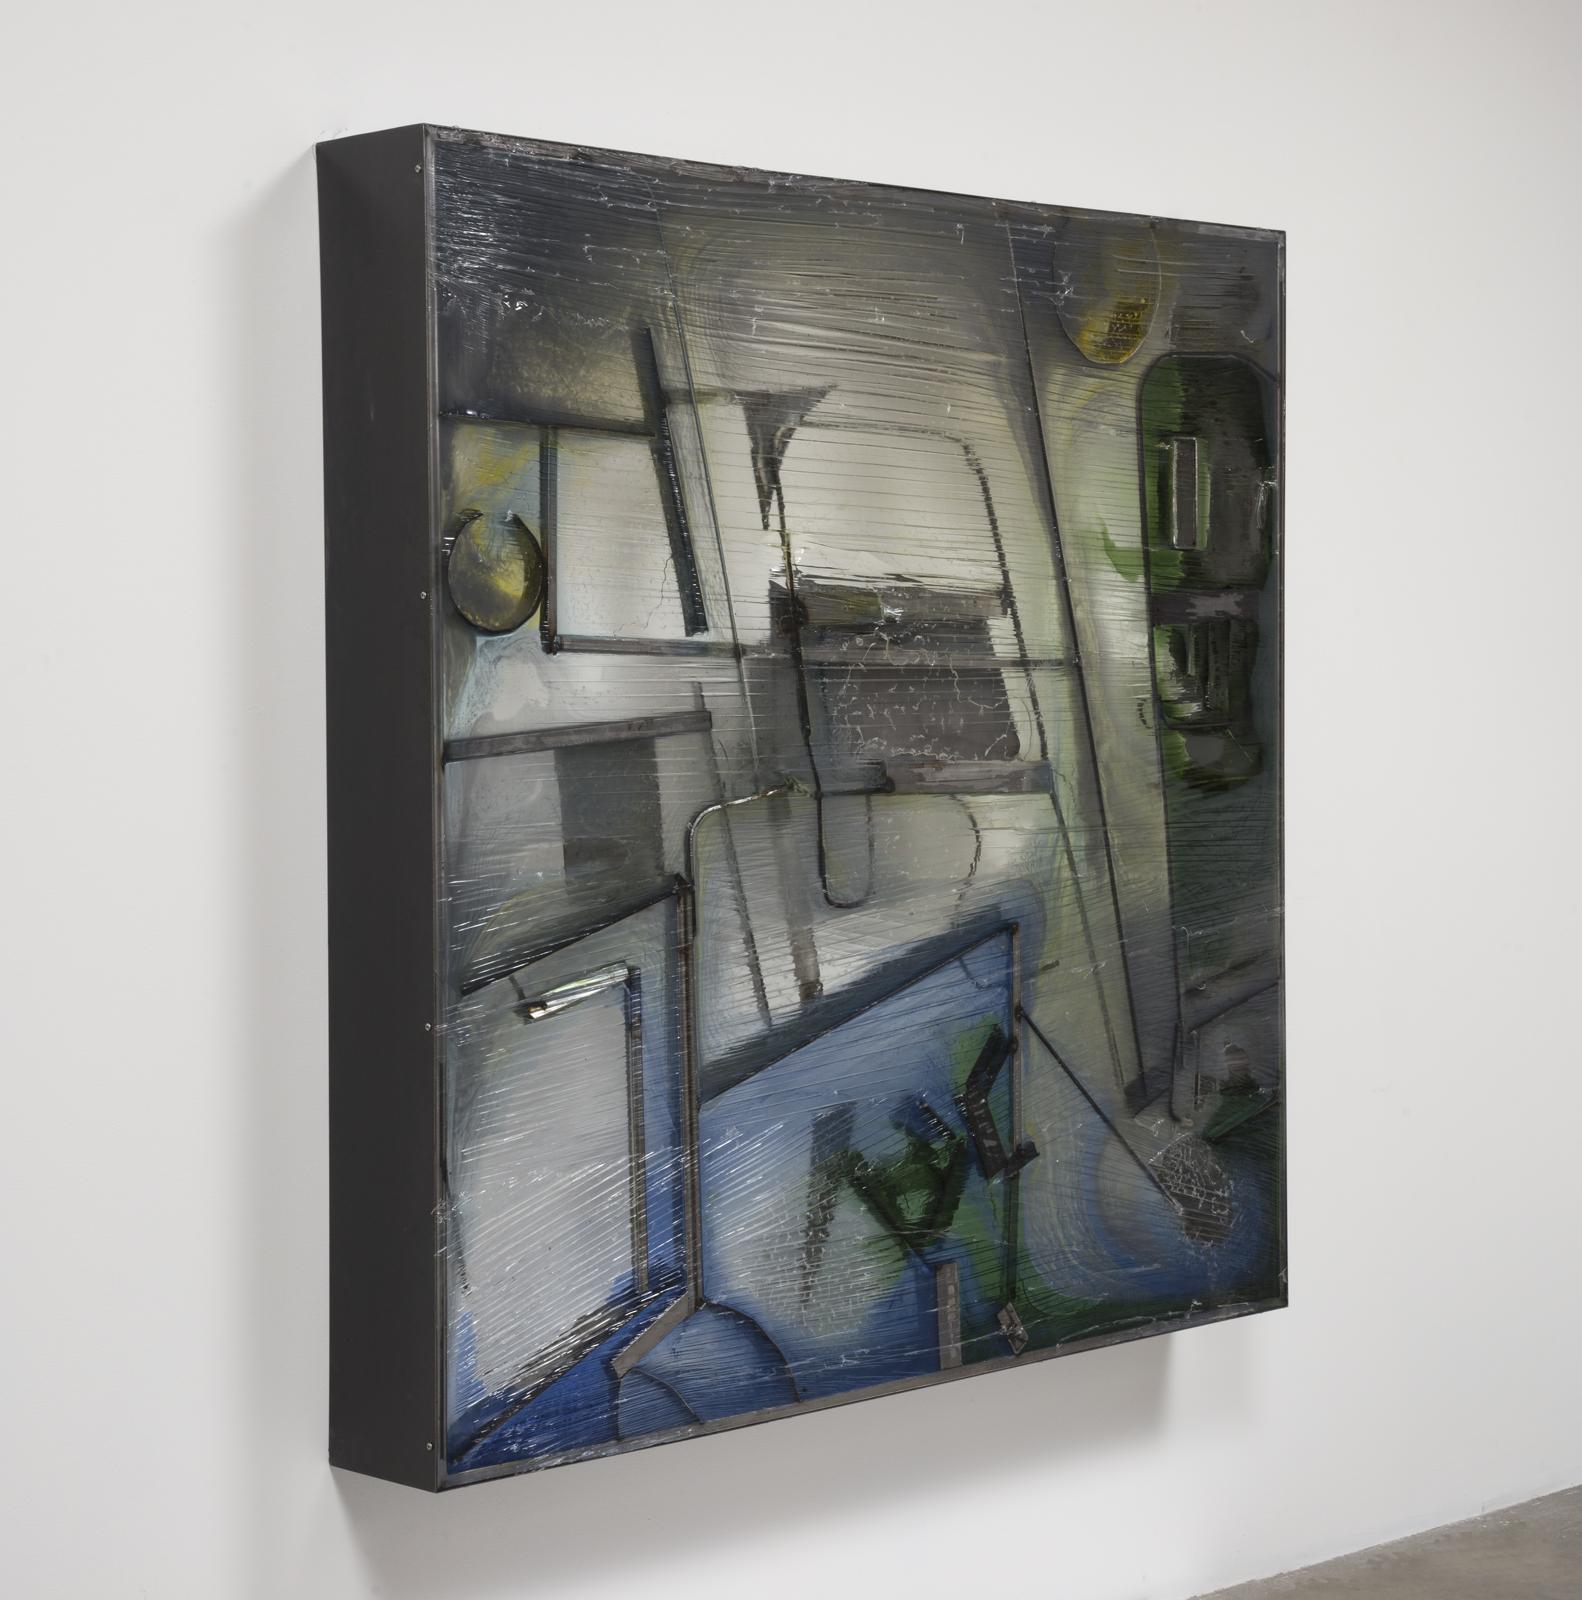 Neil Beloufa, Chutes d'Atelier, 2016 (16.001 b)